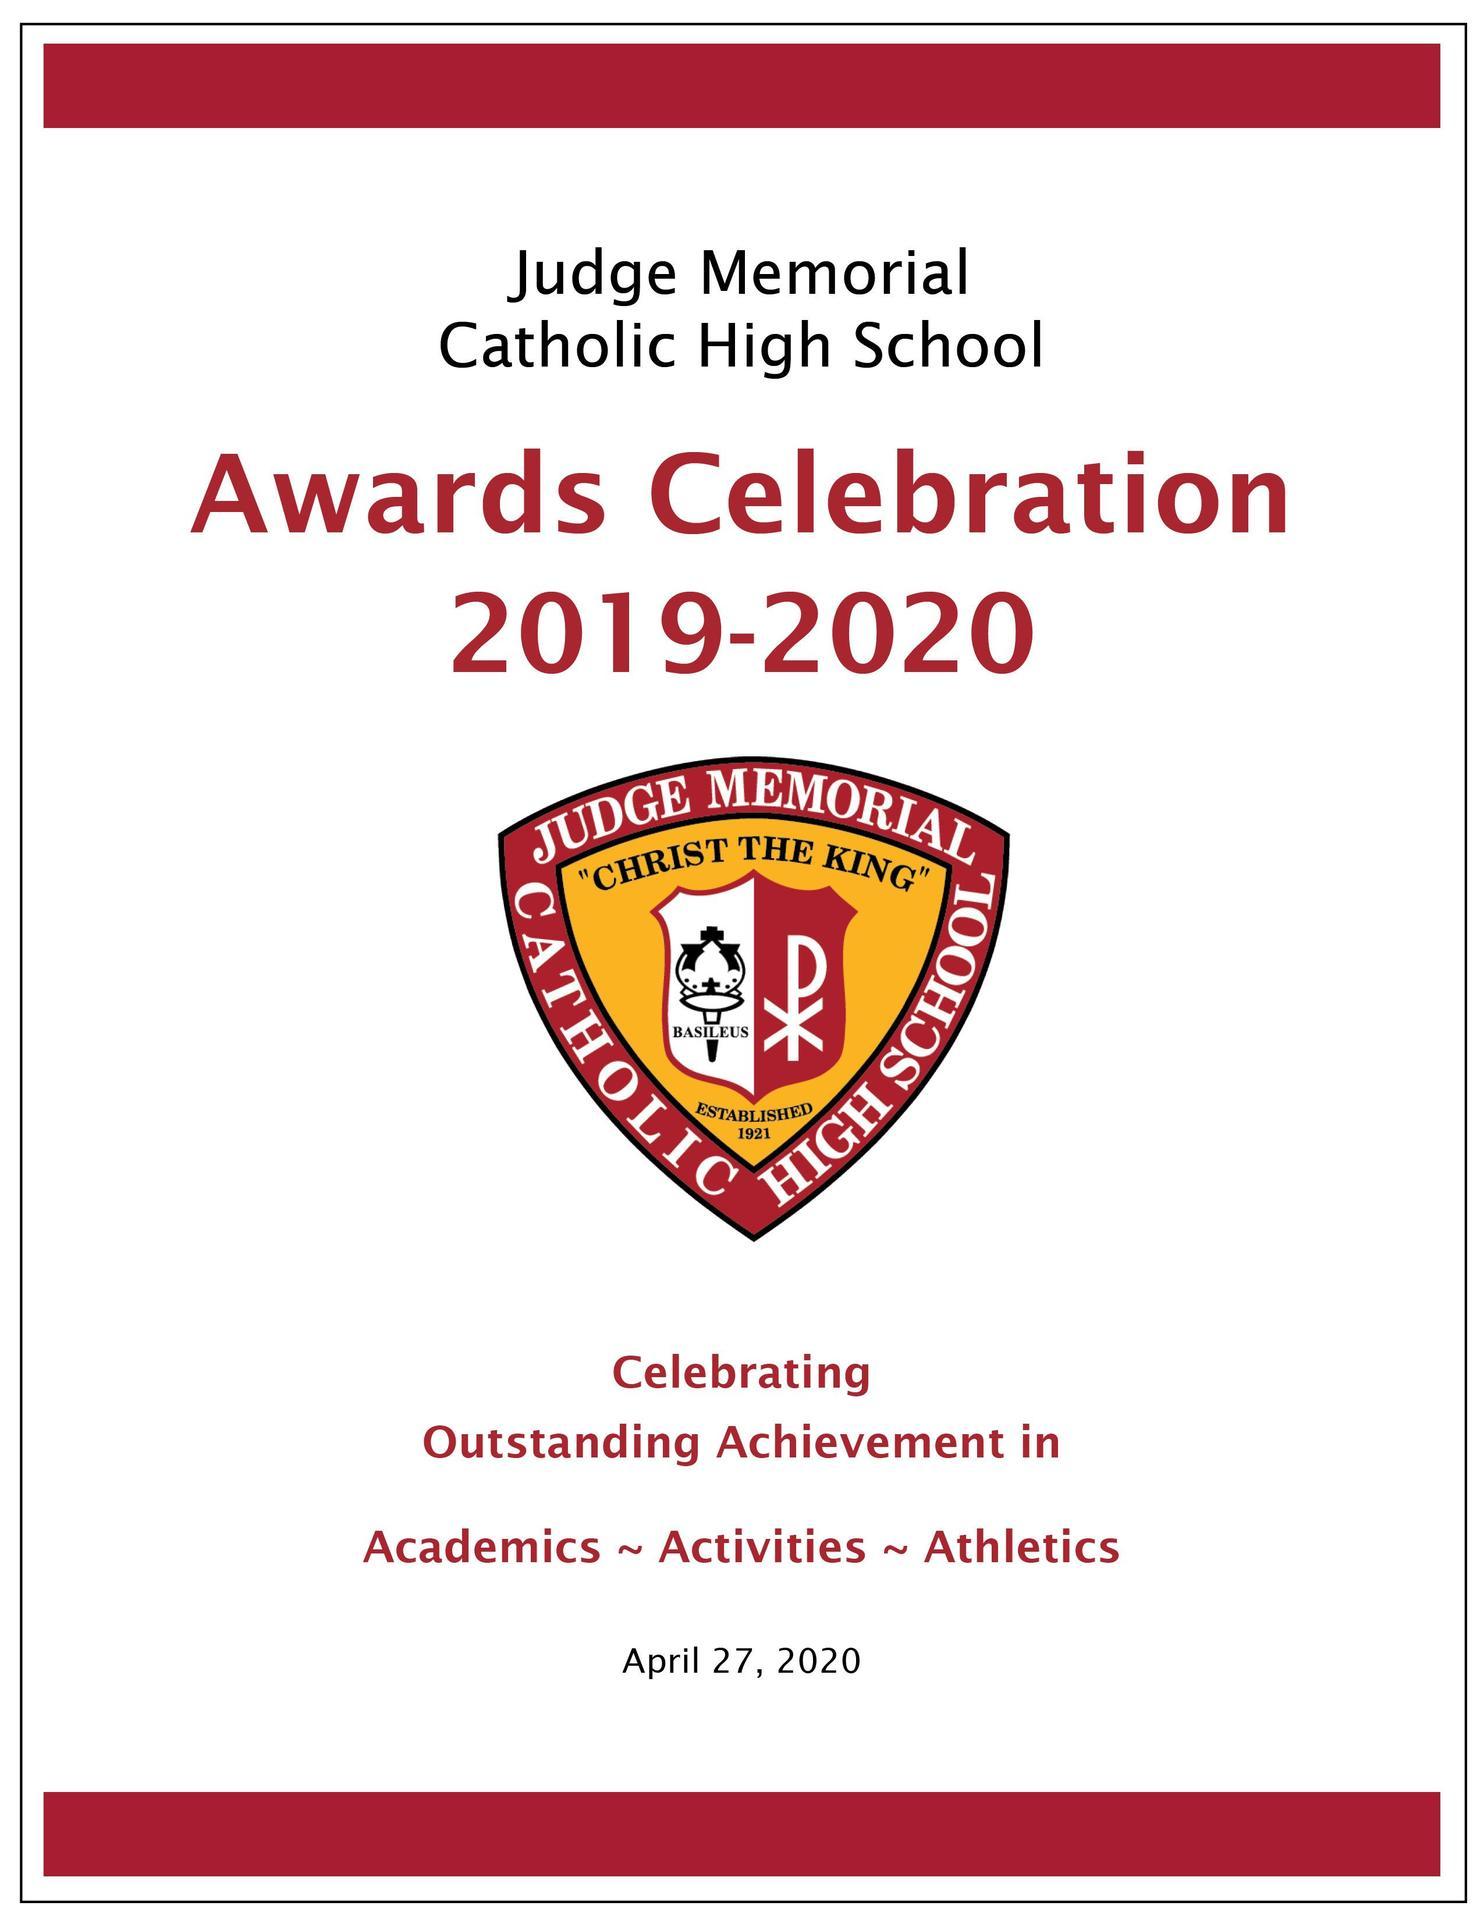 Awards Celebration Program 19-20